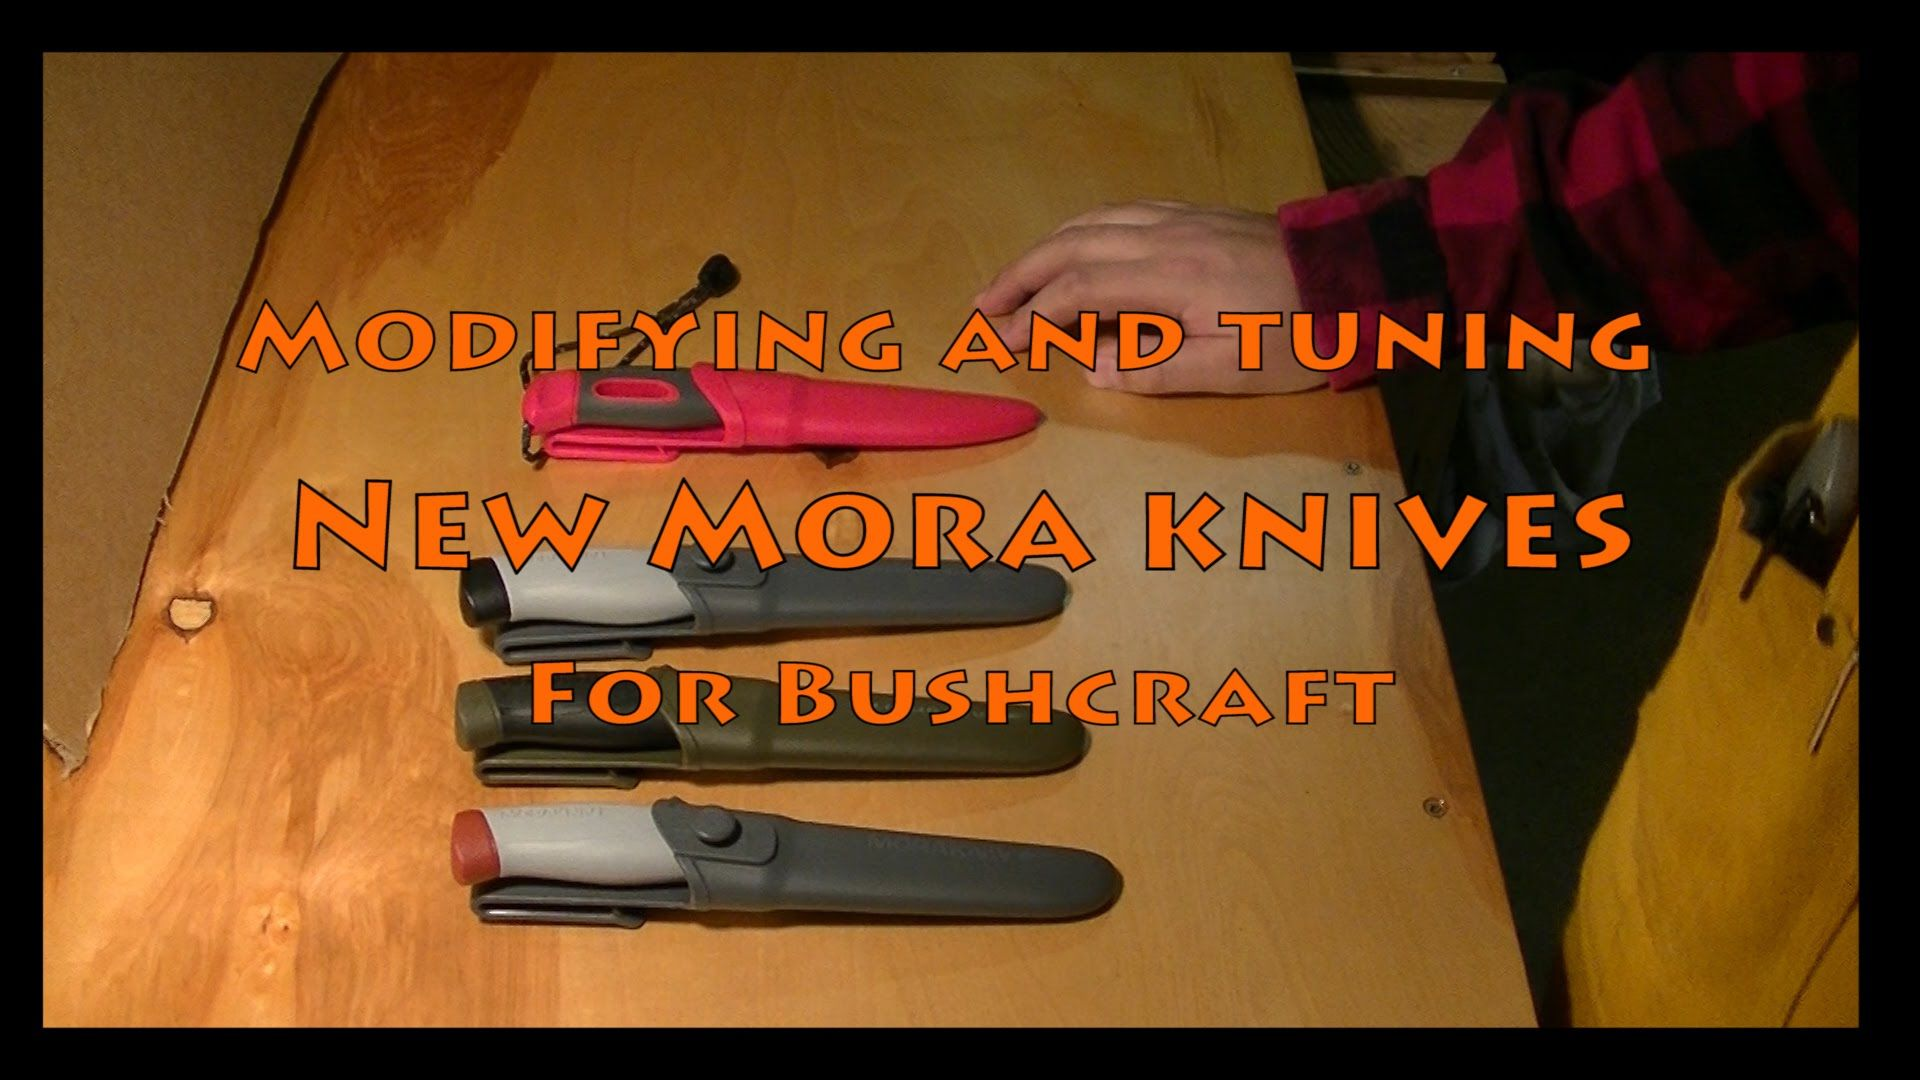 Modifying New Mora Knives for Bushcraft